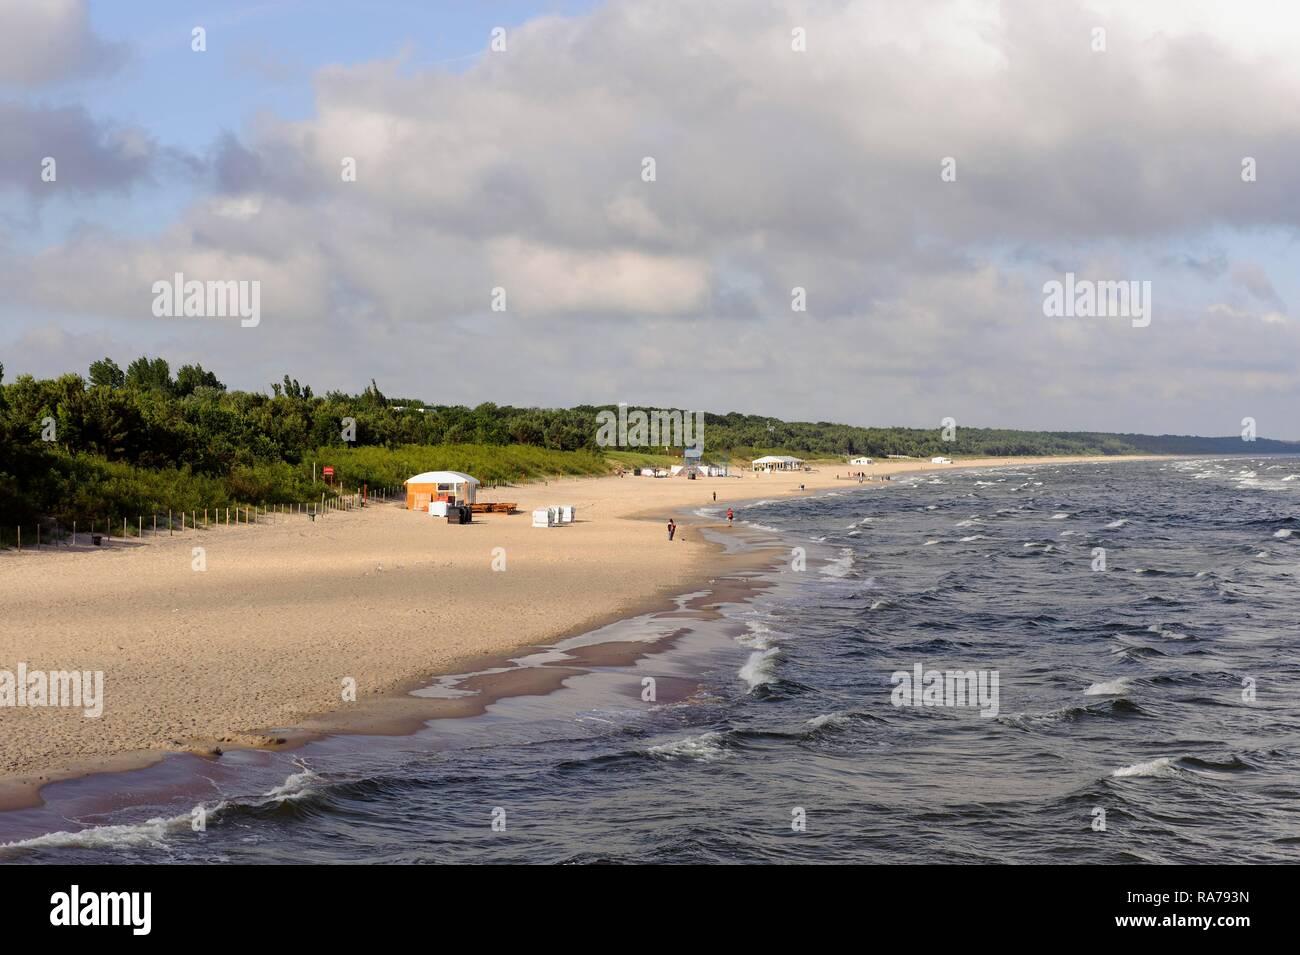 Beach, Miedzyzdroje, Misdroy, West Pomeranian Voivodeship, Poland Stock Photo